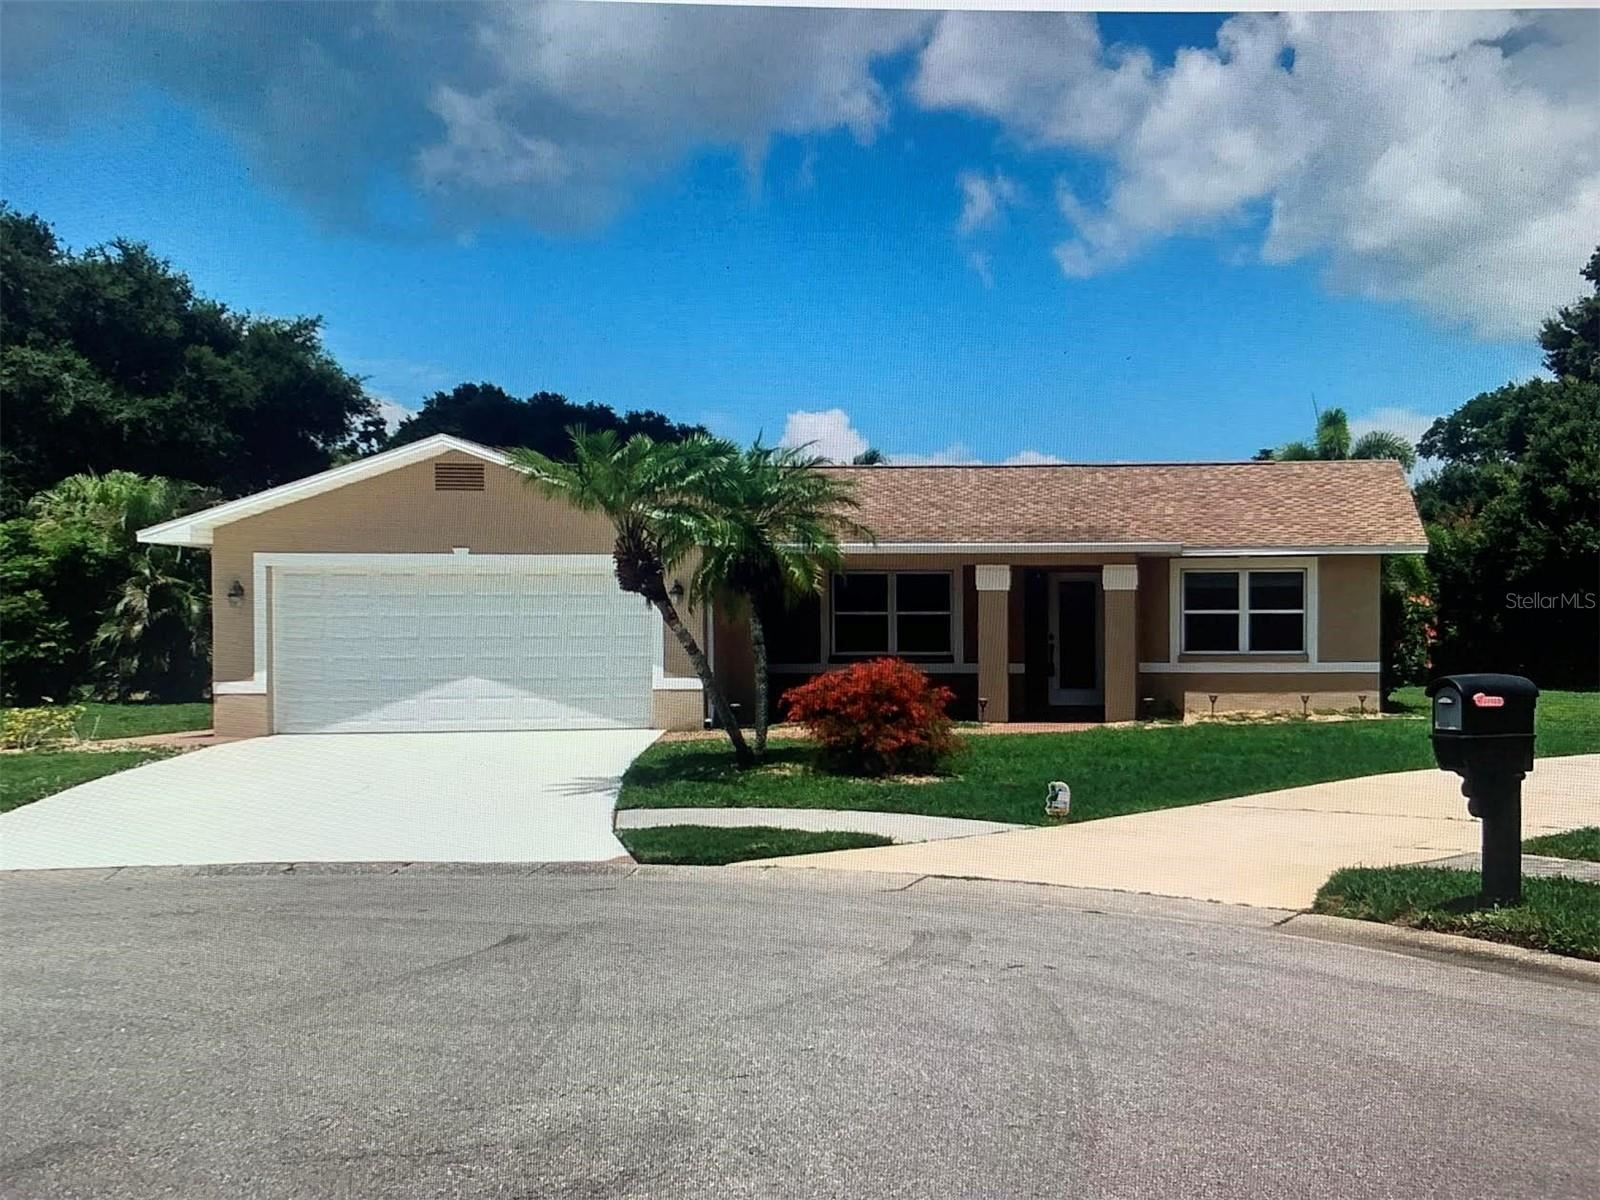 Photo of 1436 STRADA D ARGENTO, VENICE, FL 34292 (MLS # N6116464)